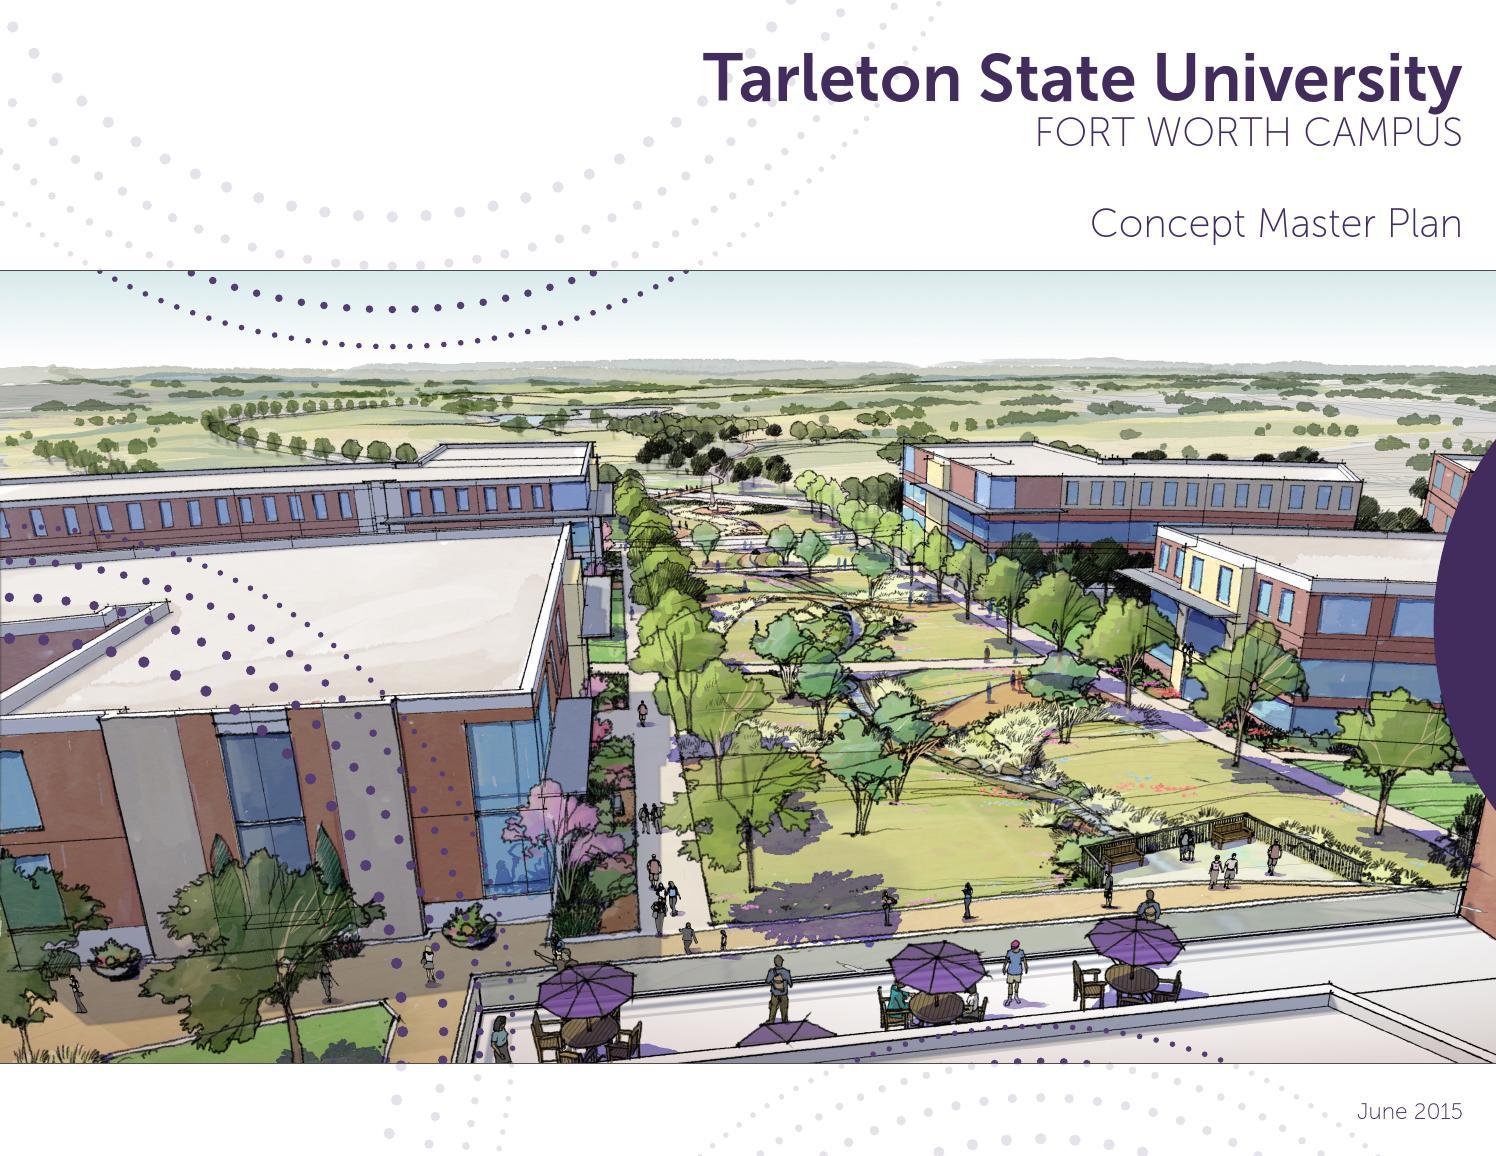 Tarleton State Campus Map.Tarleton State University Fort Worth Campus Concept Plan By Broaddus